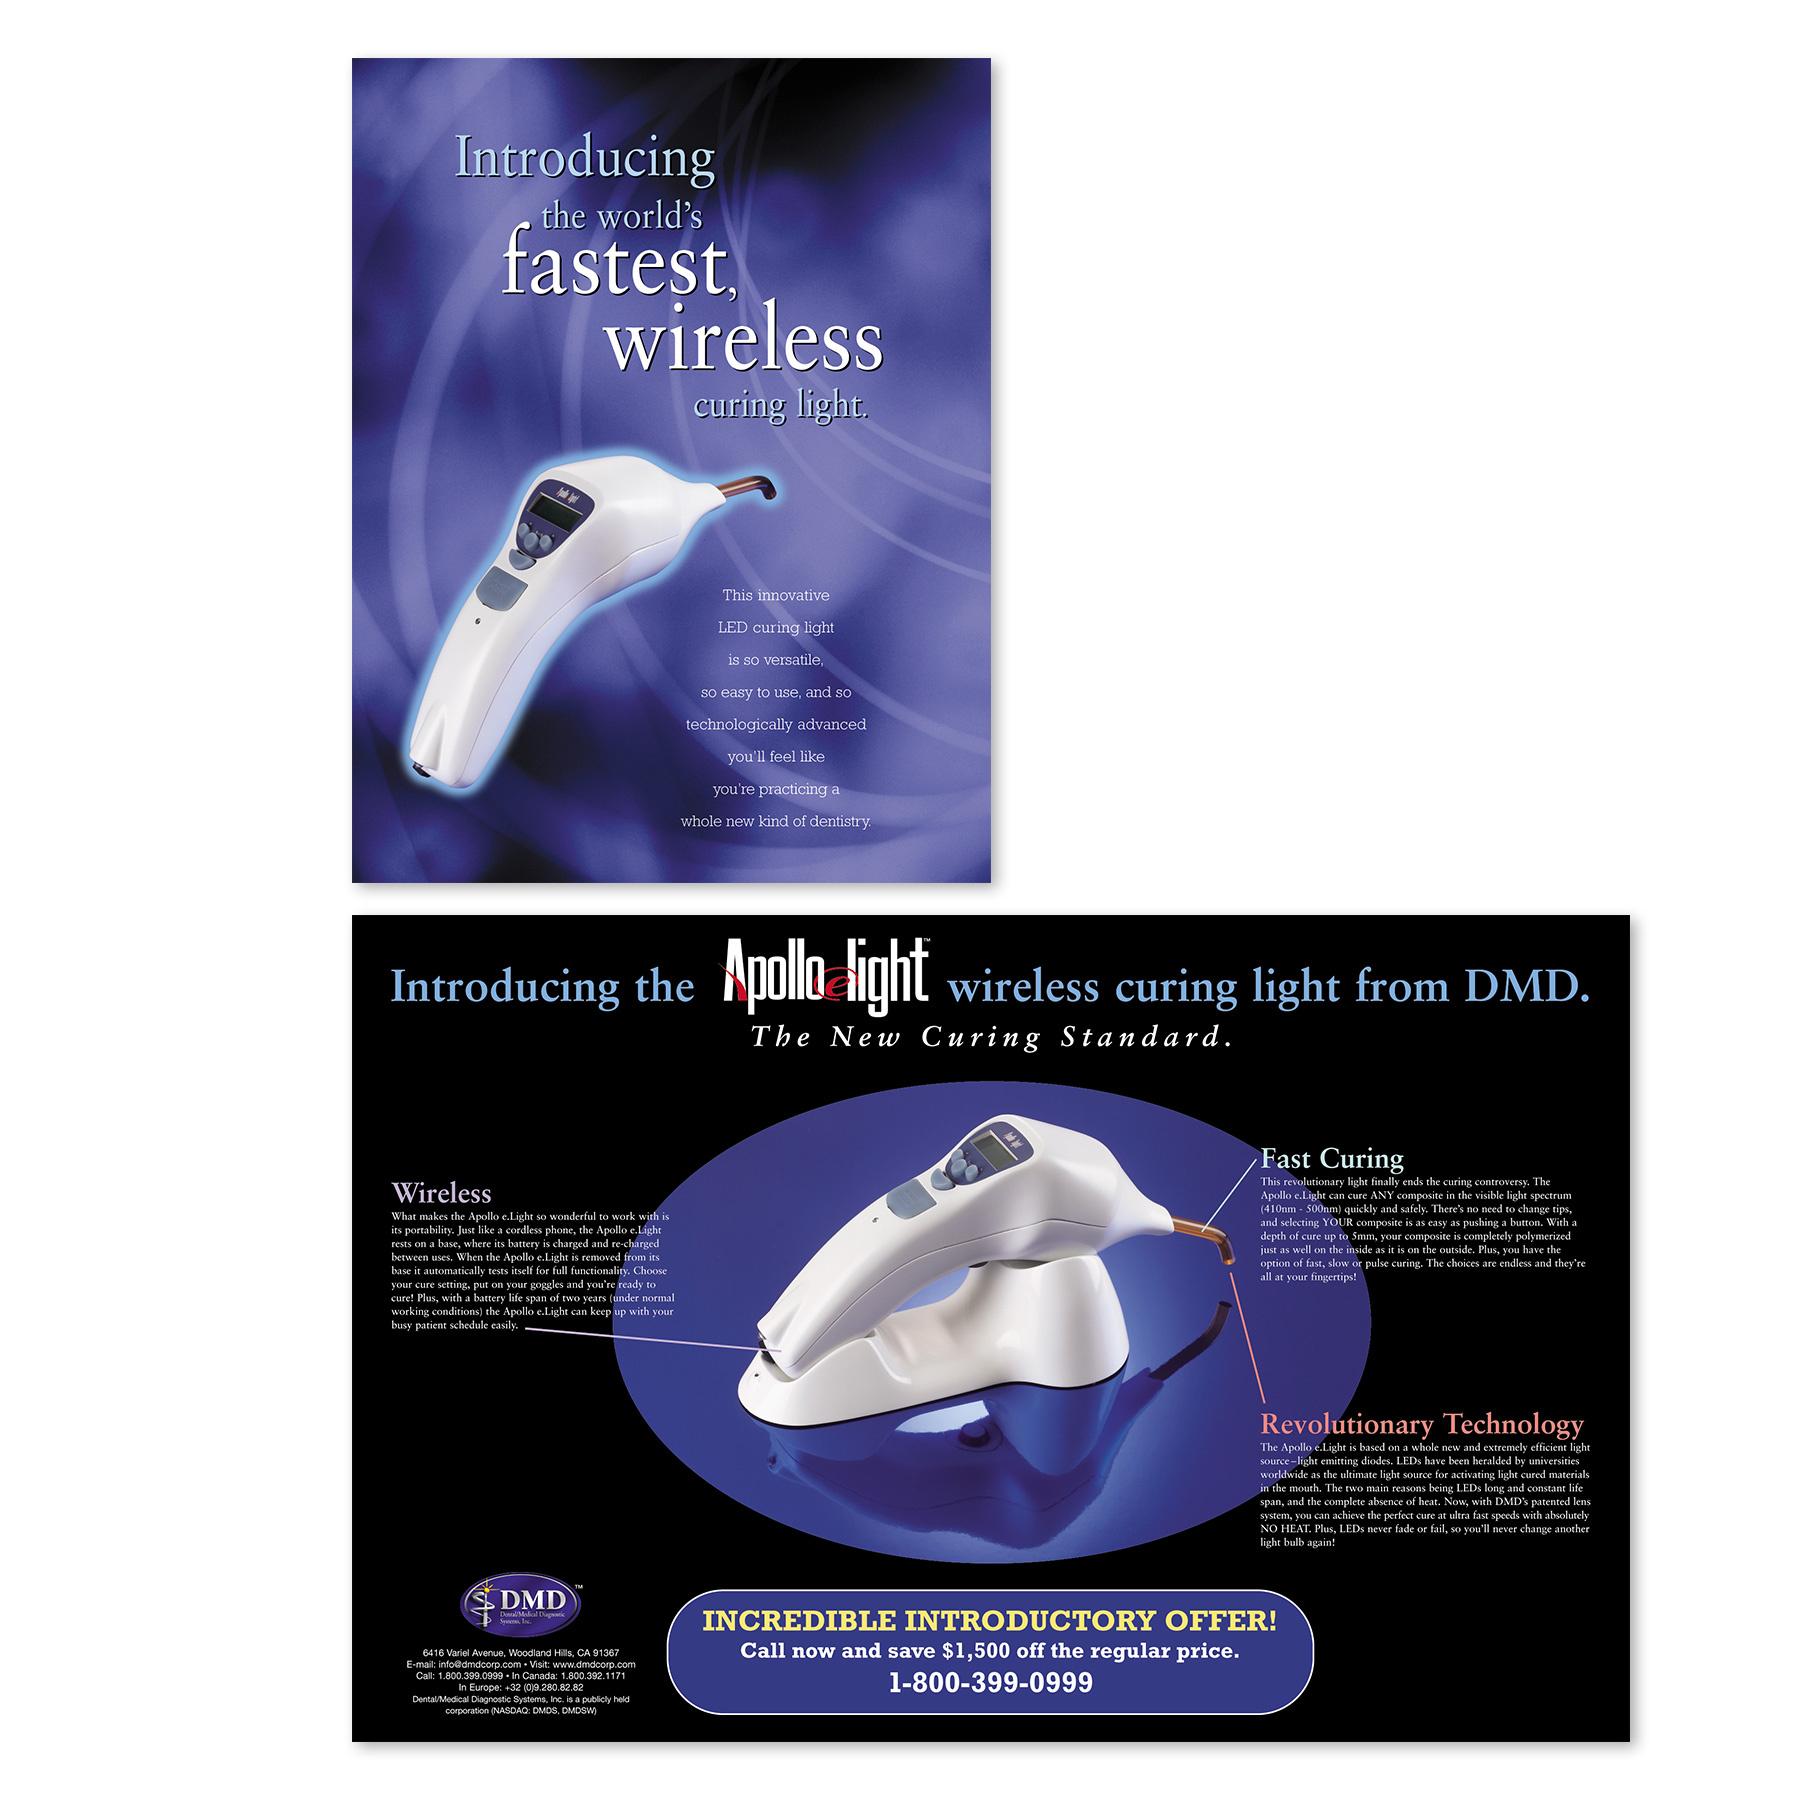 DMD Apollo Dental Product Brochure